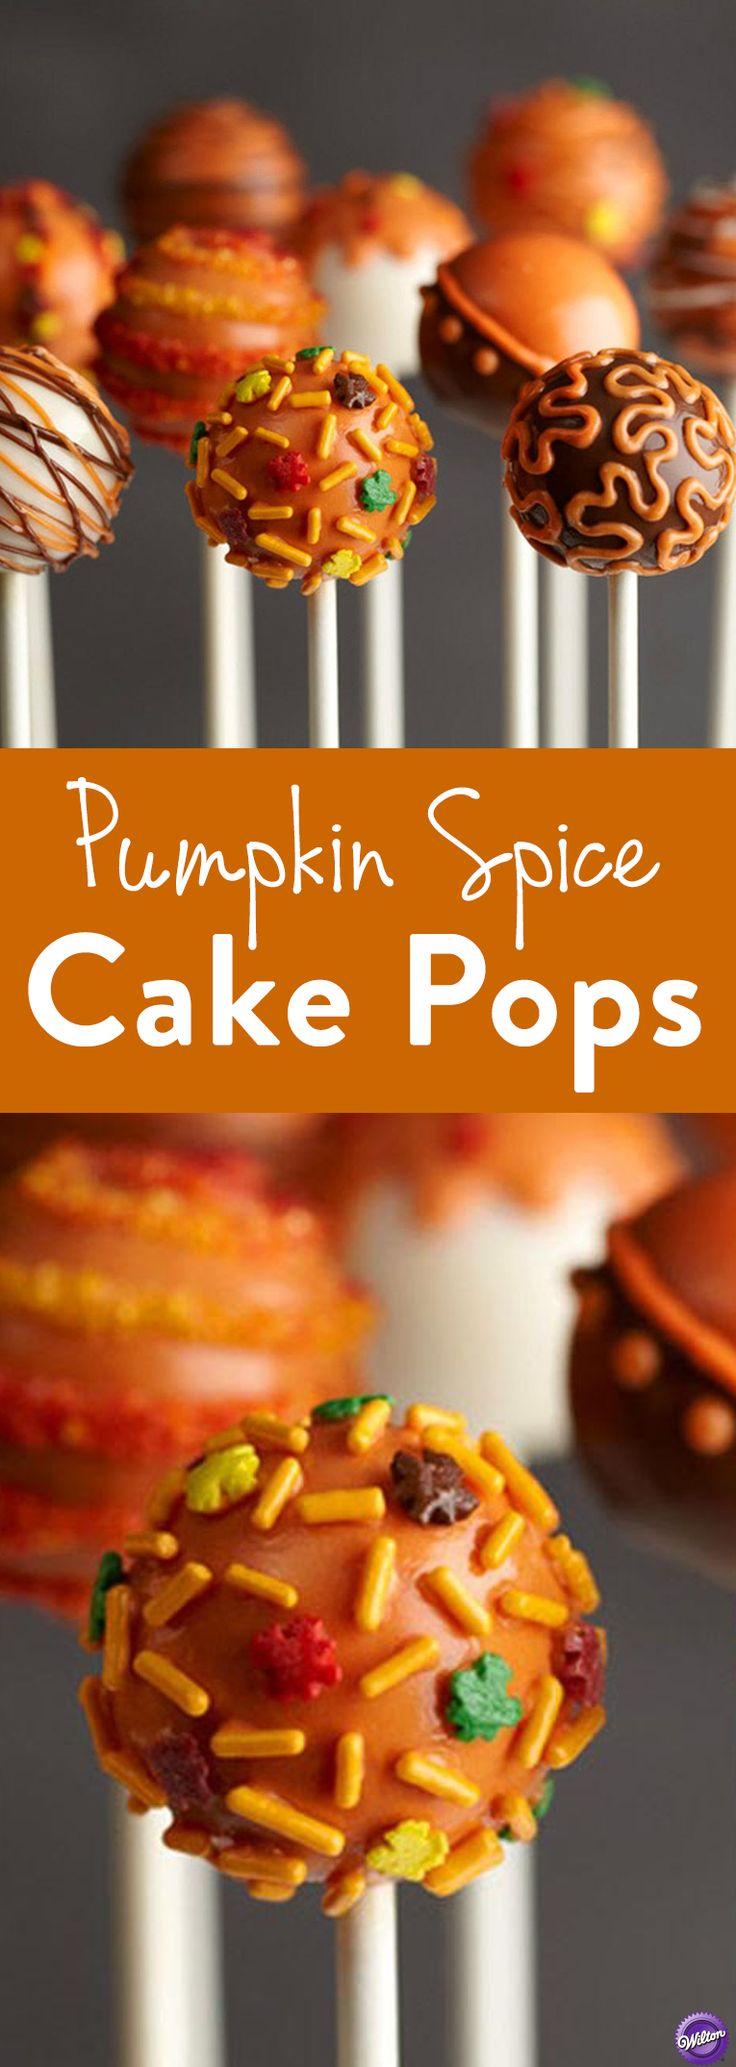 Pumpkin Spice Cake Pops 4131 best Cake